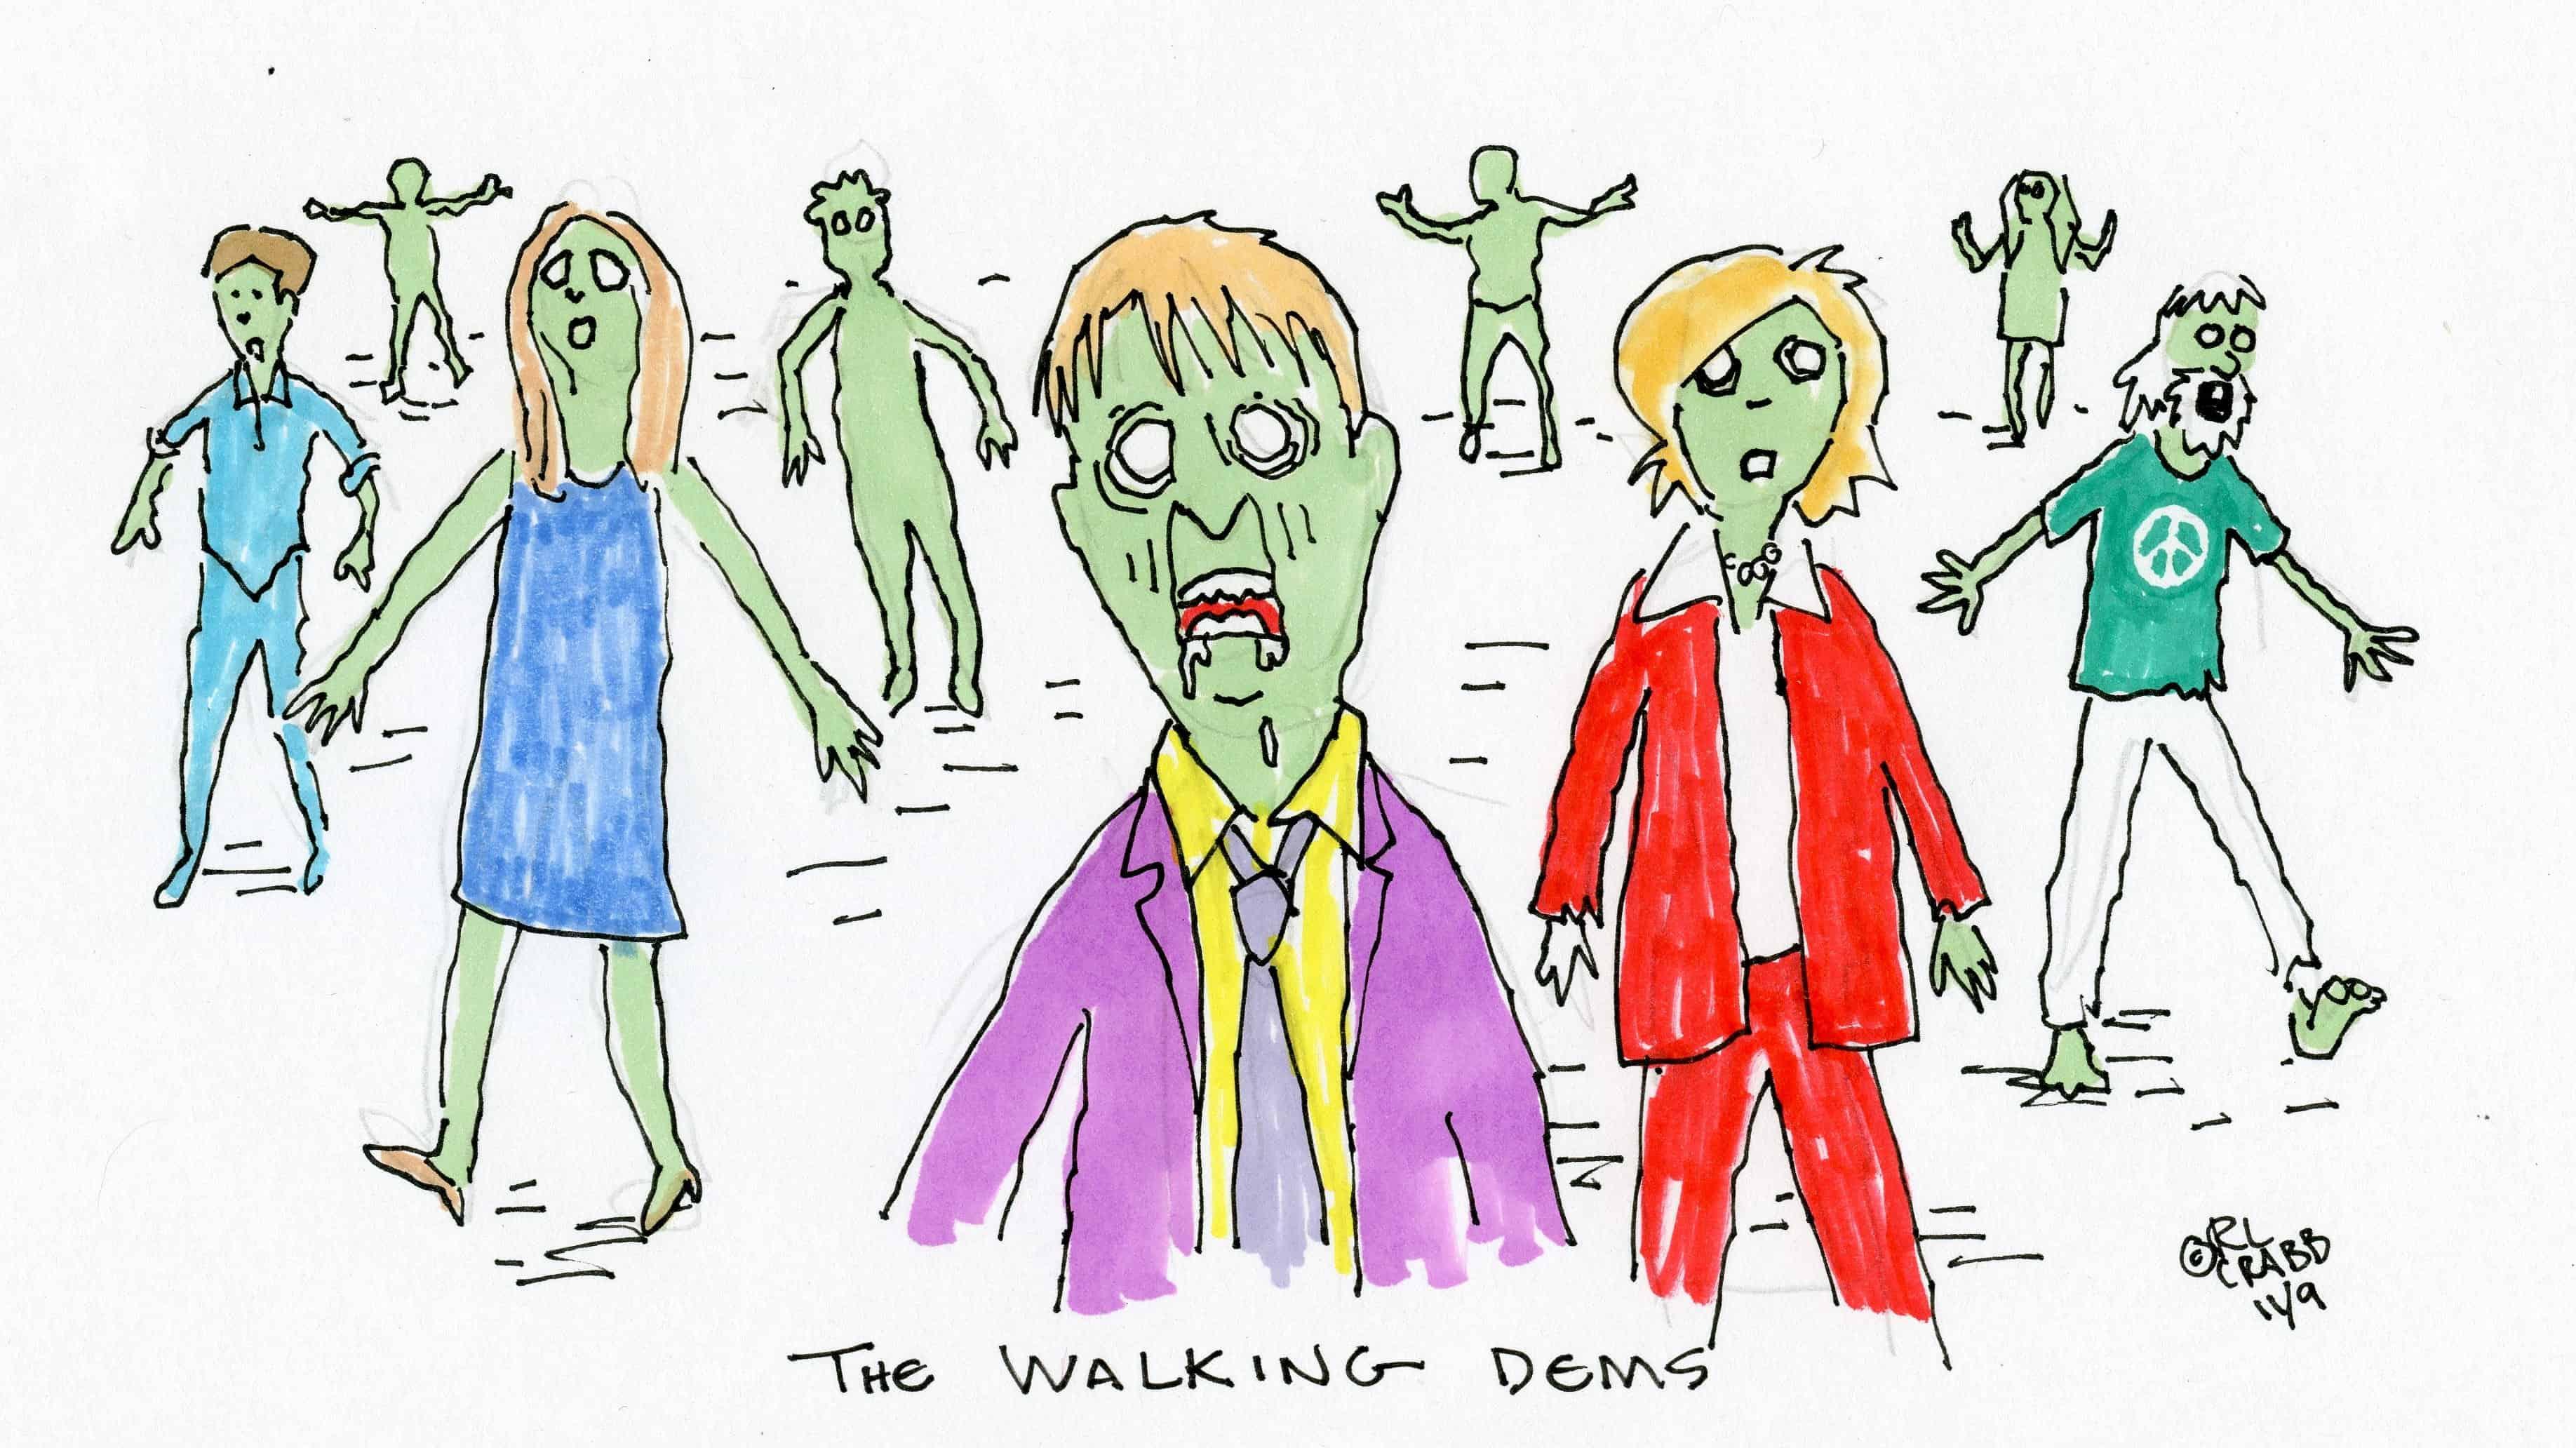 walking-dems028